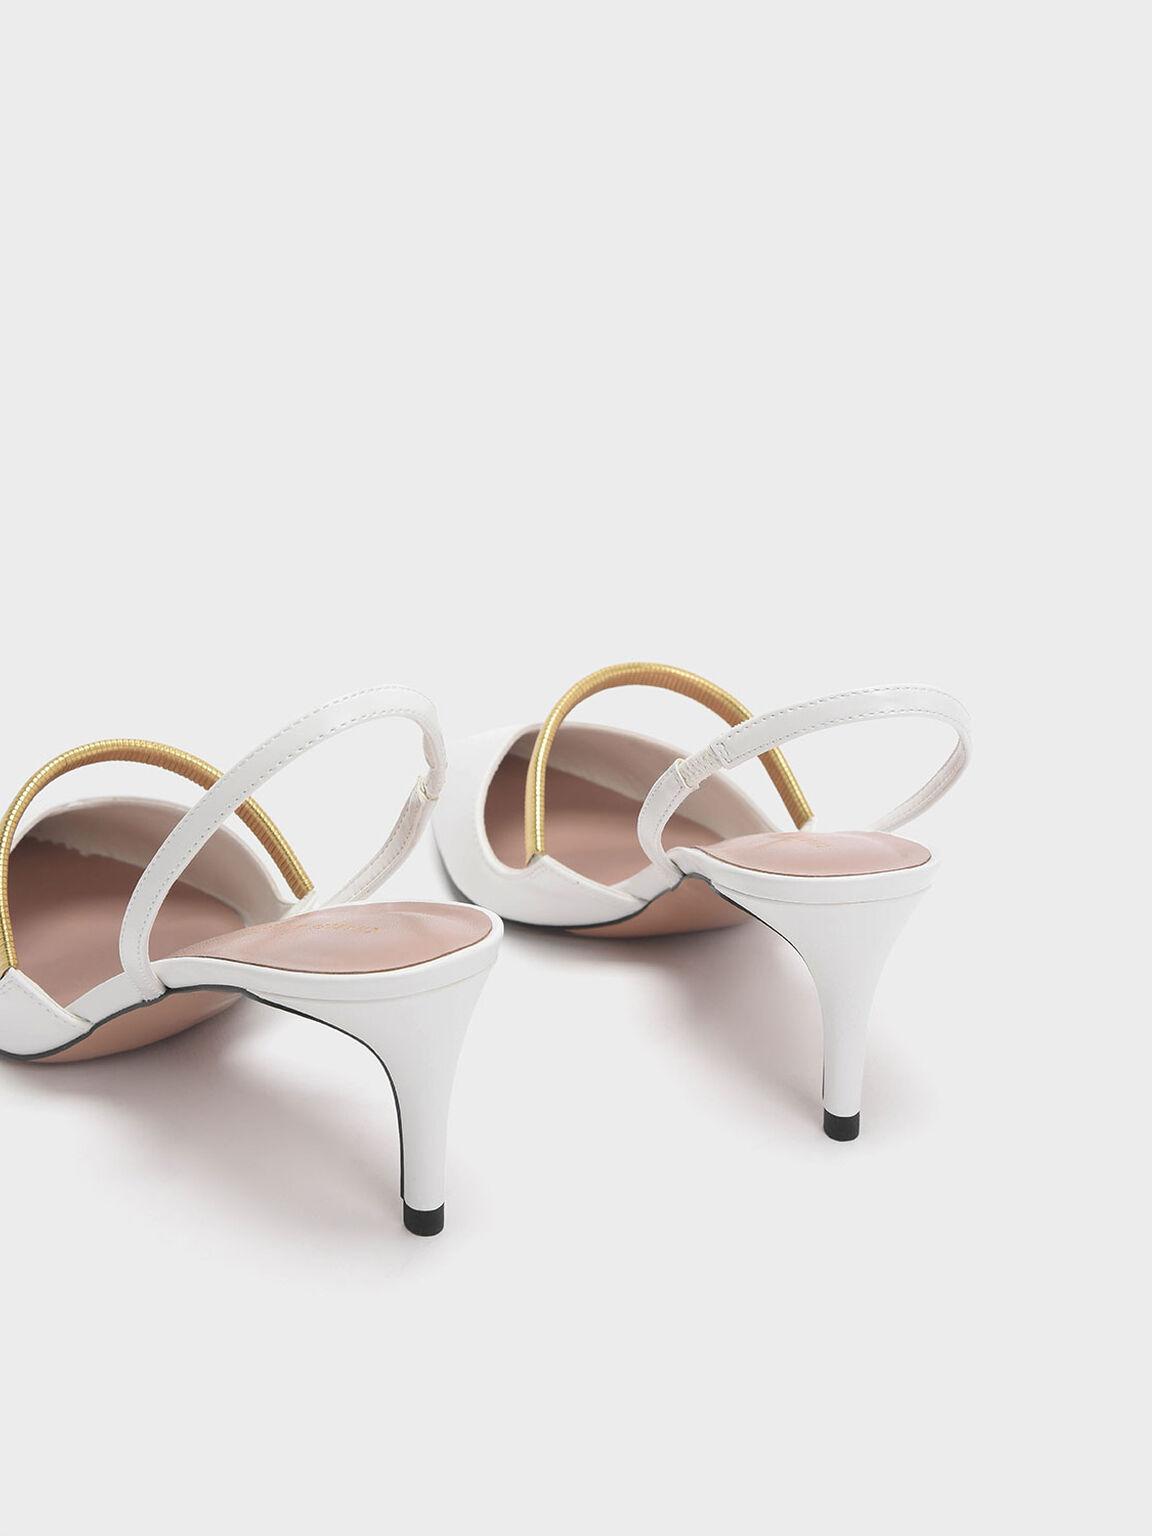 Gold Mary Jane Strap Slingback Heels, White, hi-res